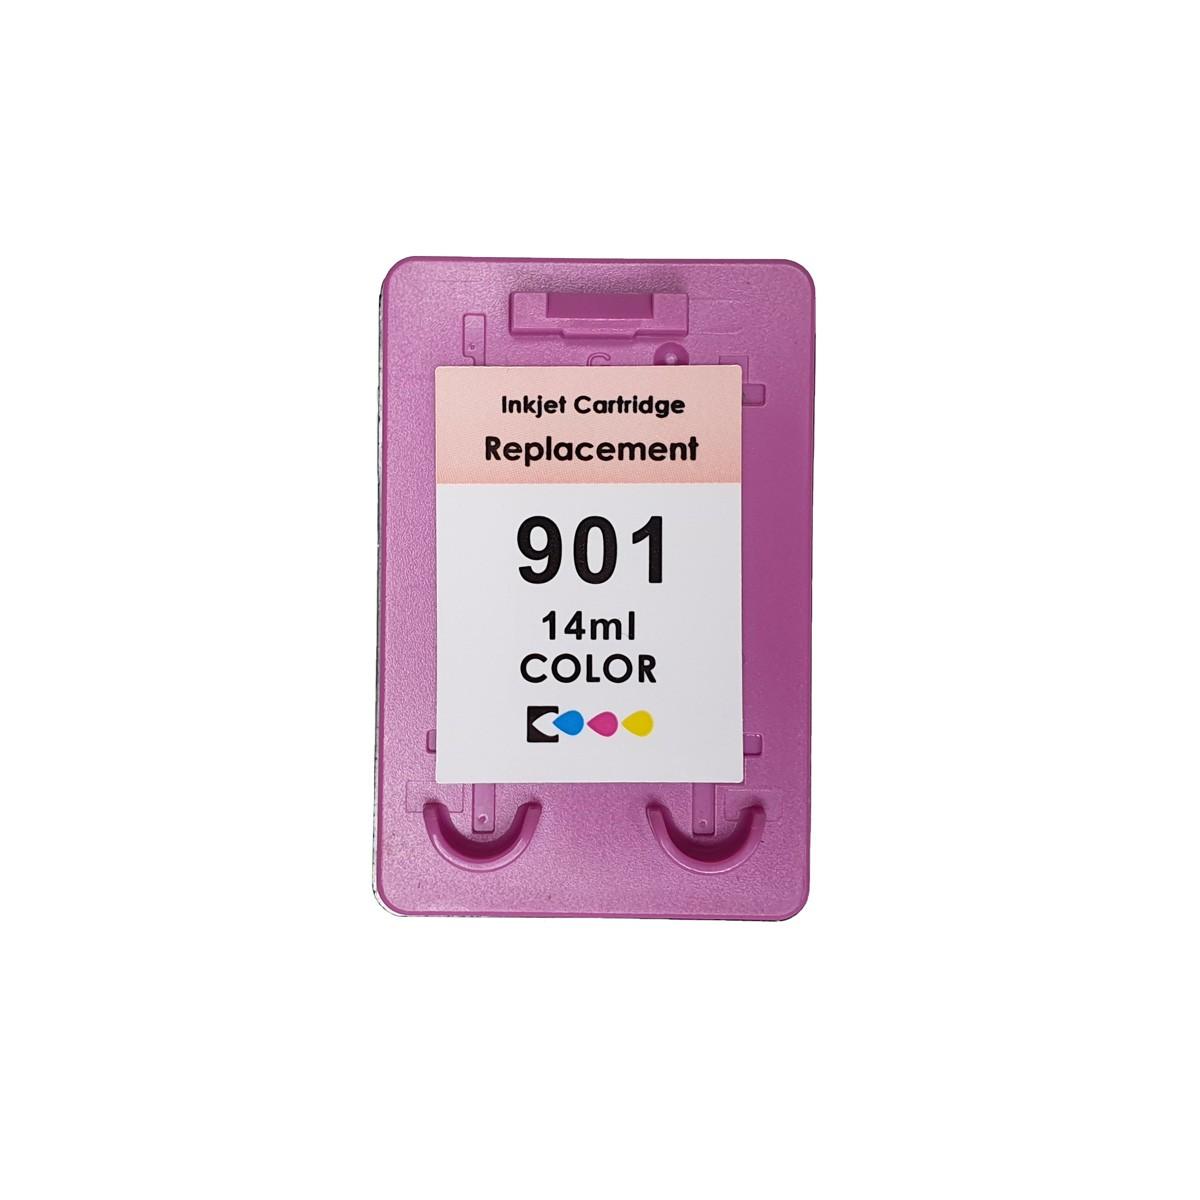 Cartucho MJ Compatível HP901XL Colorido 14ml para J4540 J4550 J4580 J4680 J4660 da HP